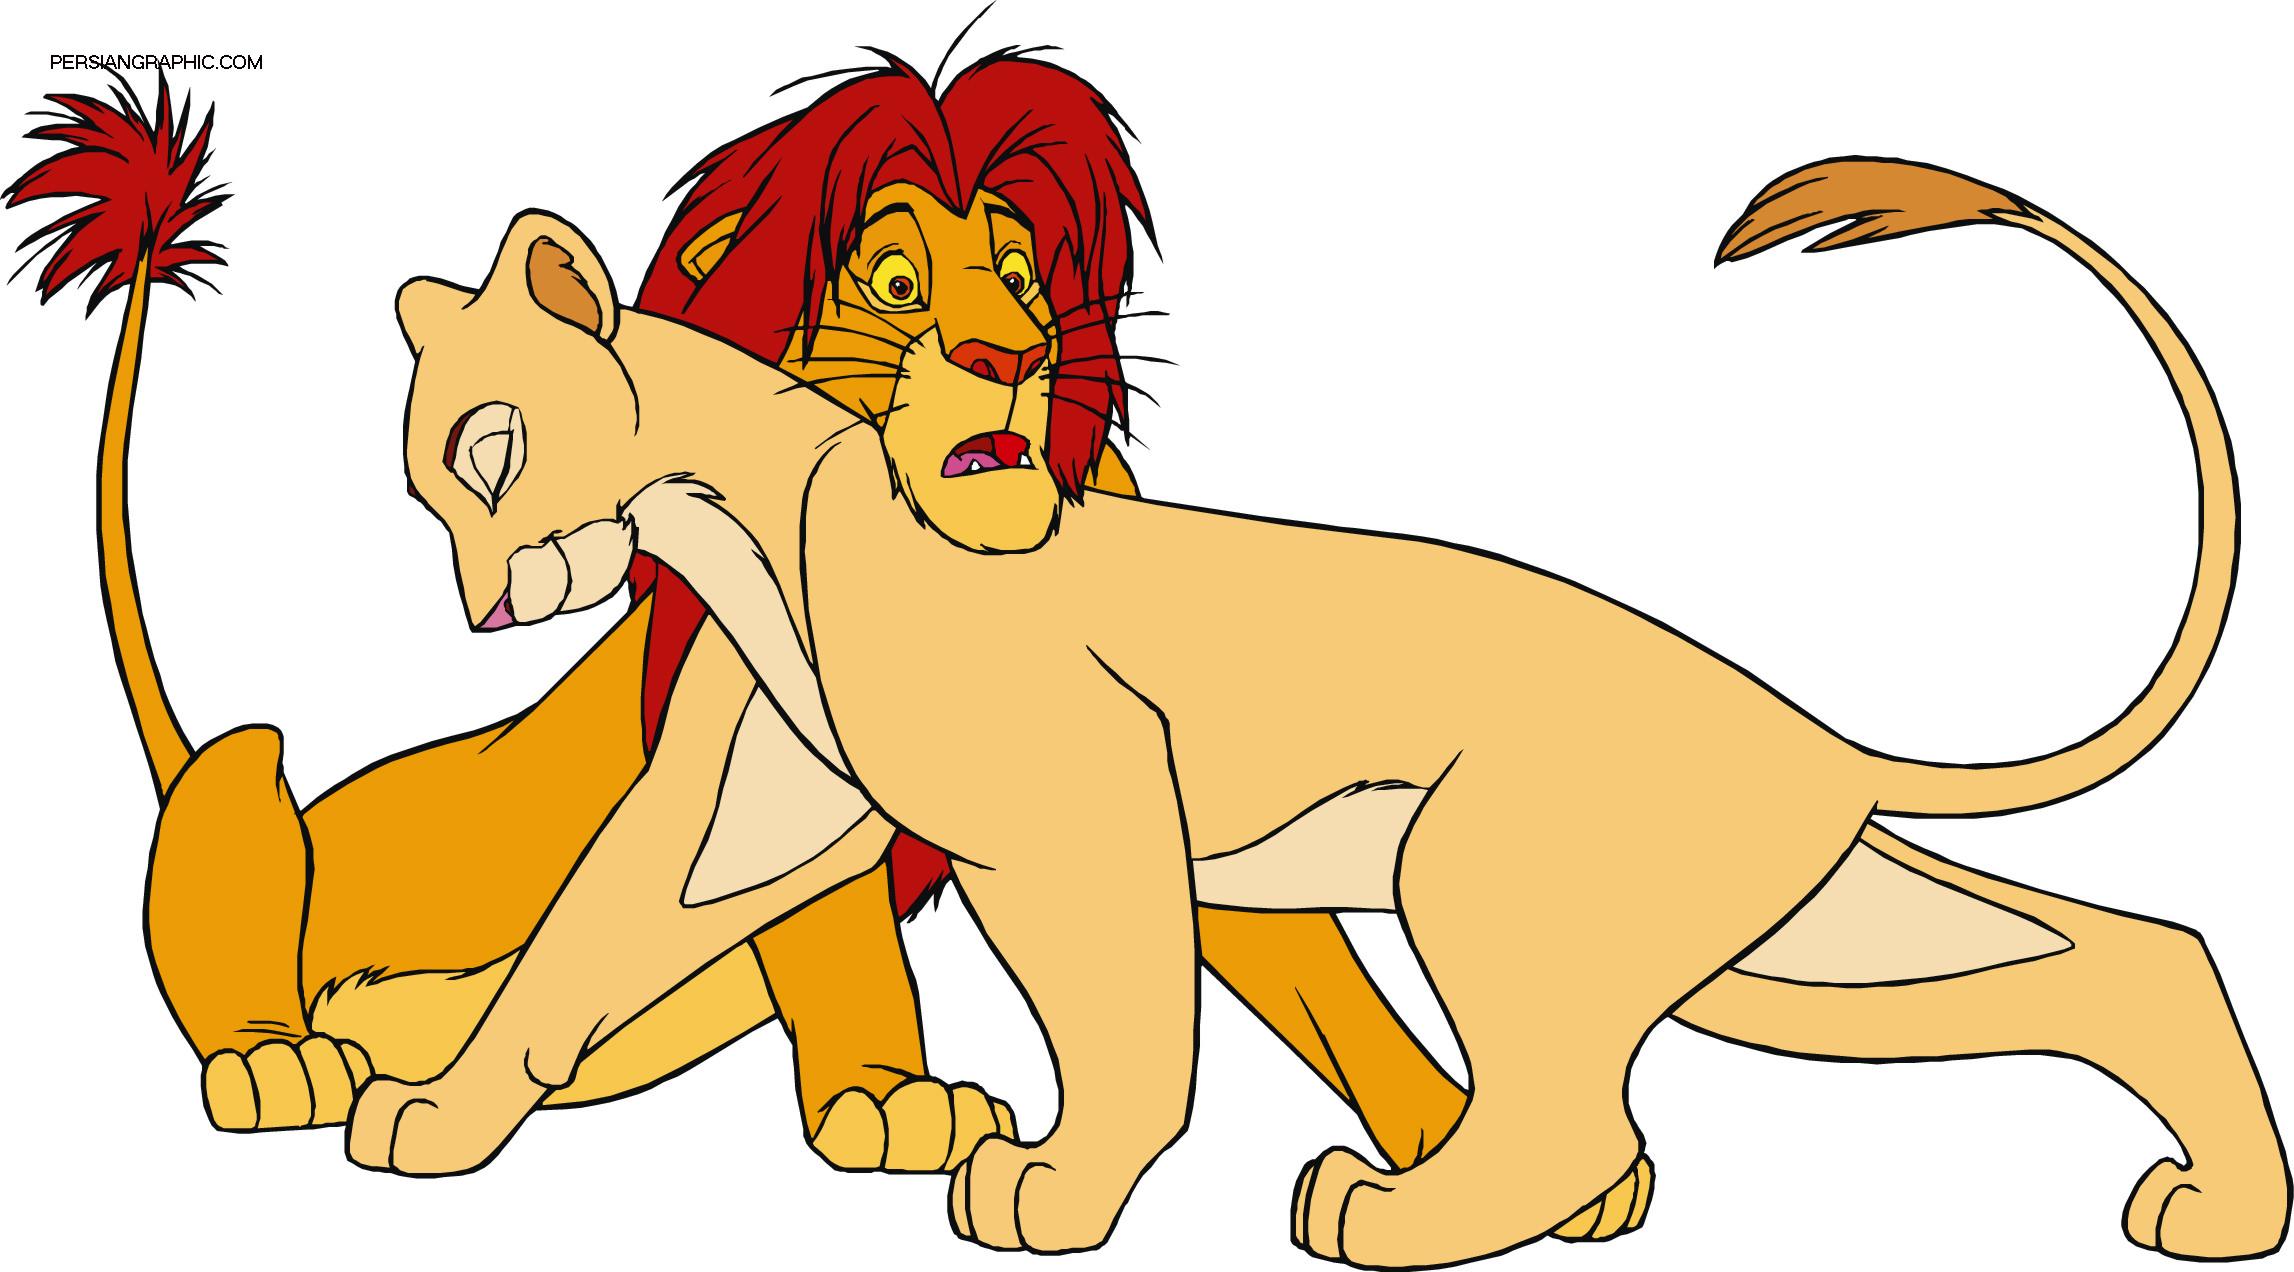 Lion king porn free nude movies